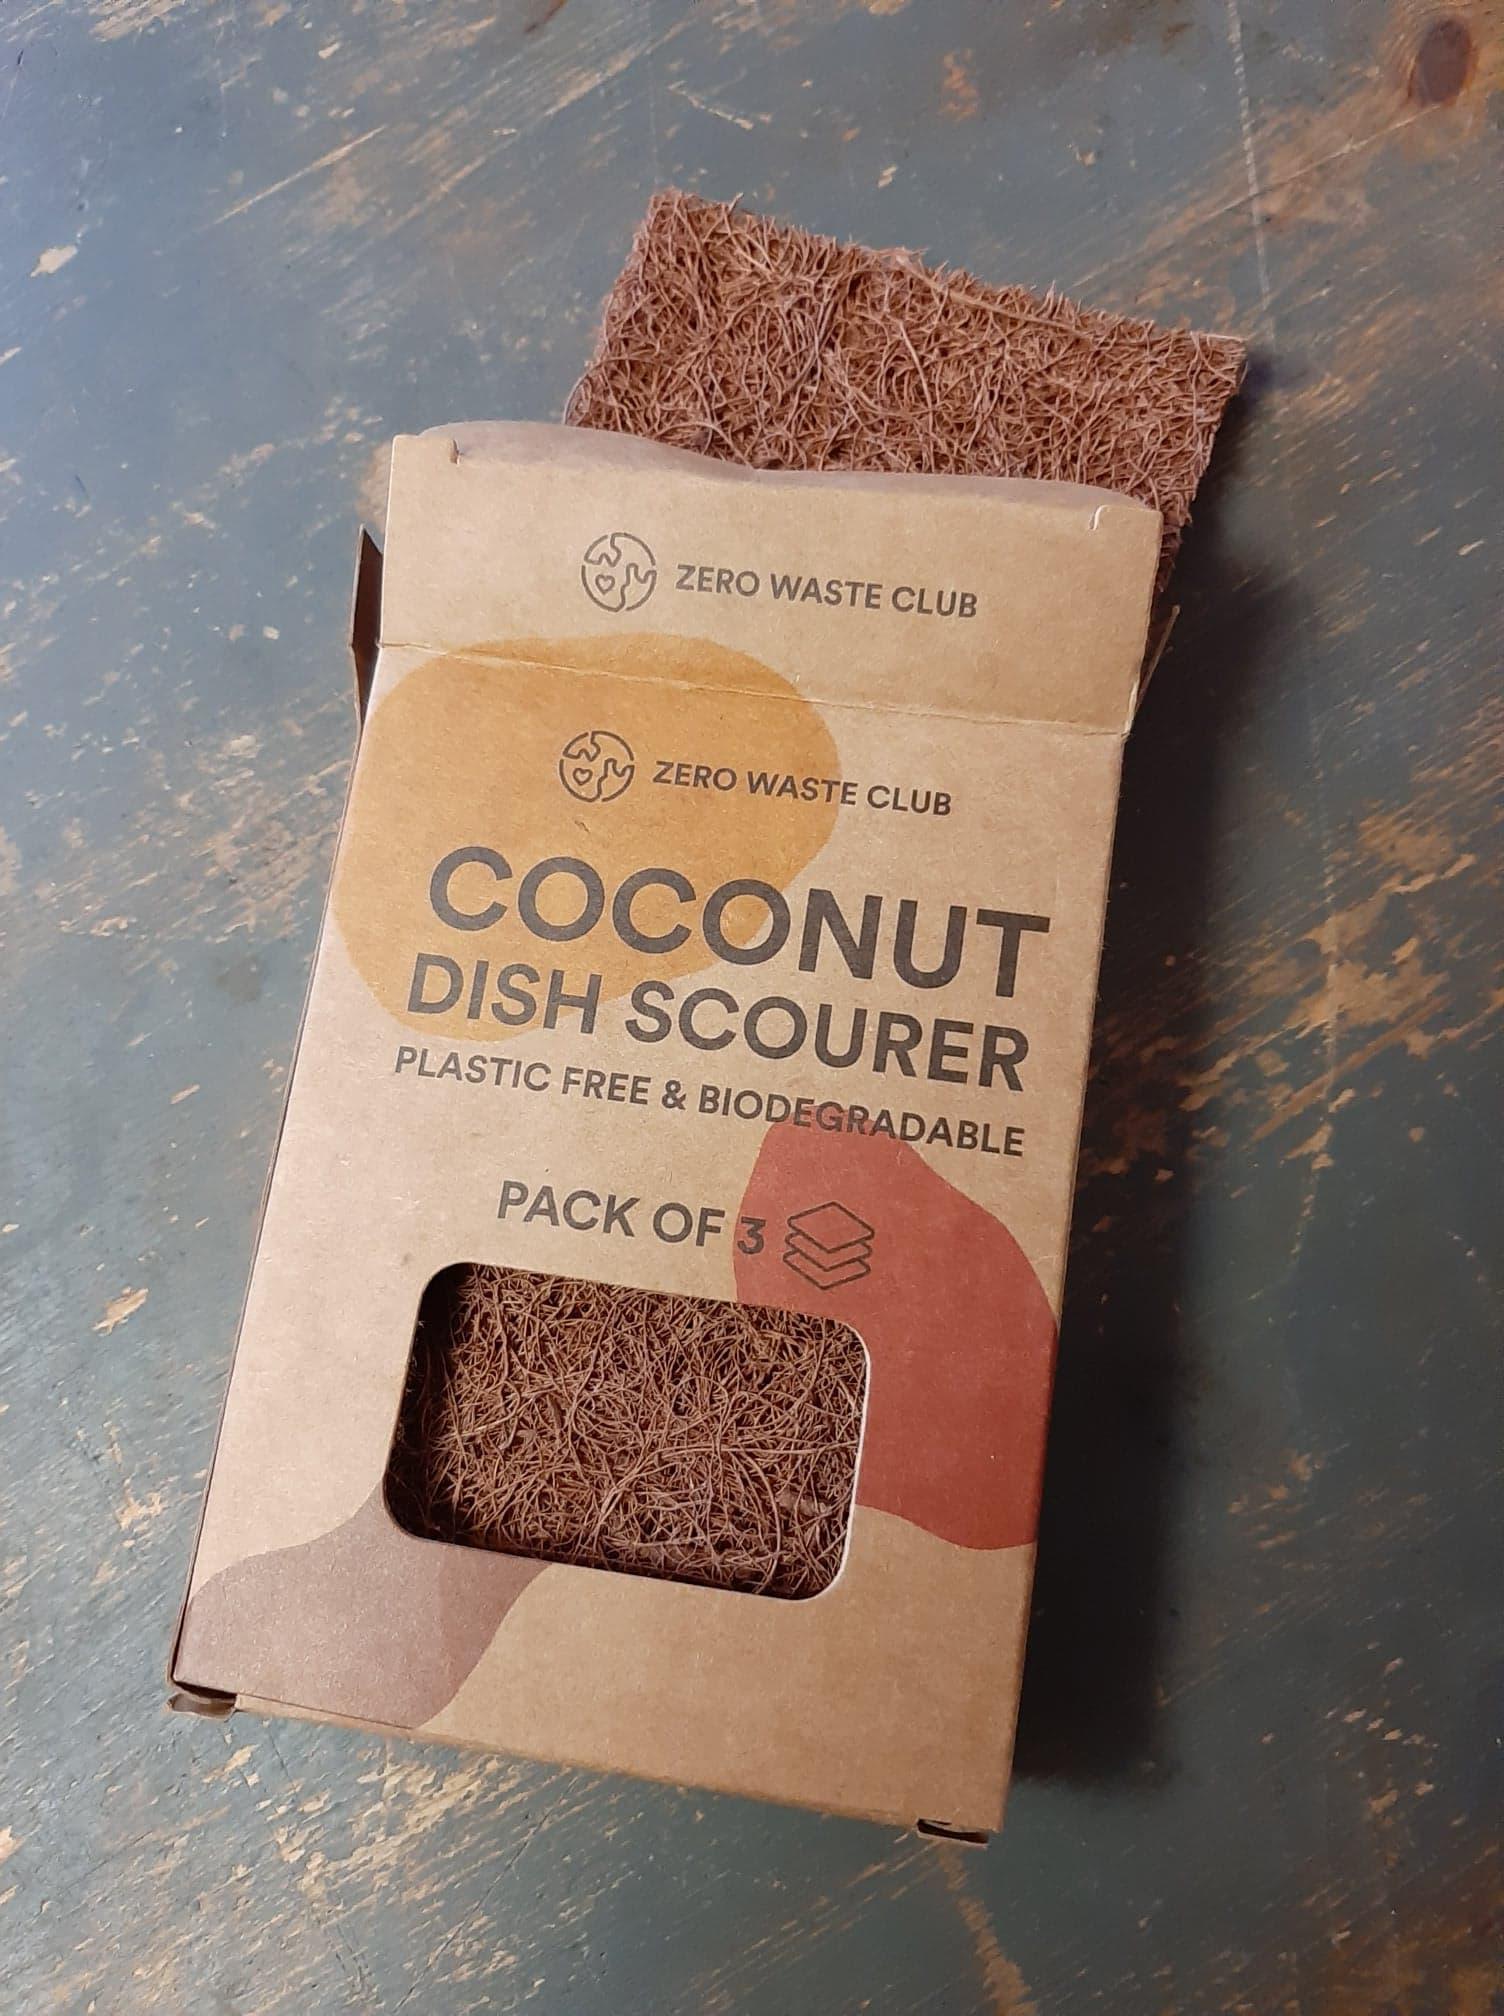 Coconut Dish Scourers